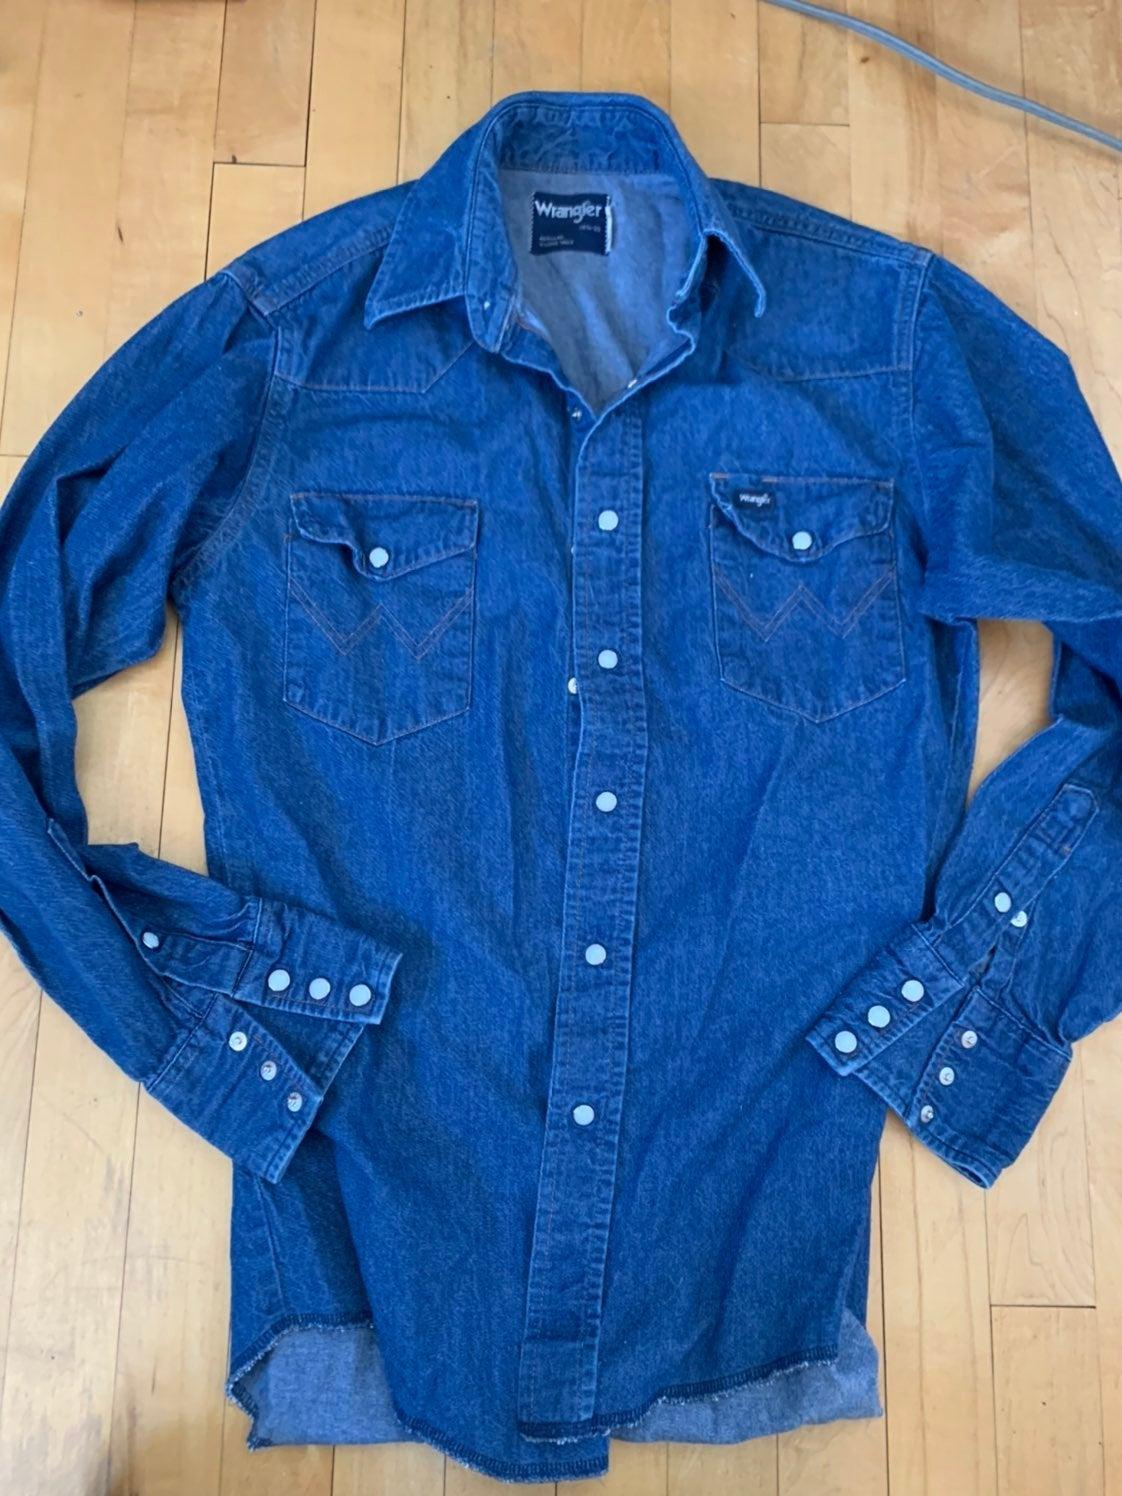 CLassic wrangler denim shirt